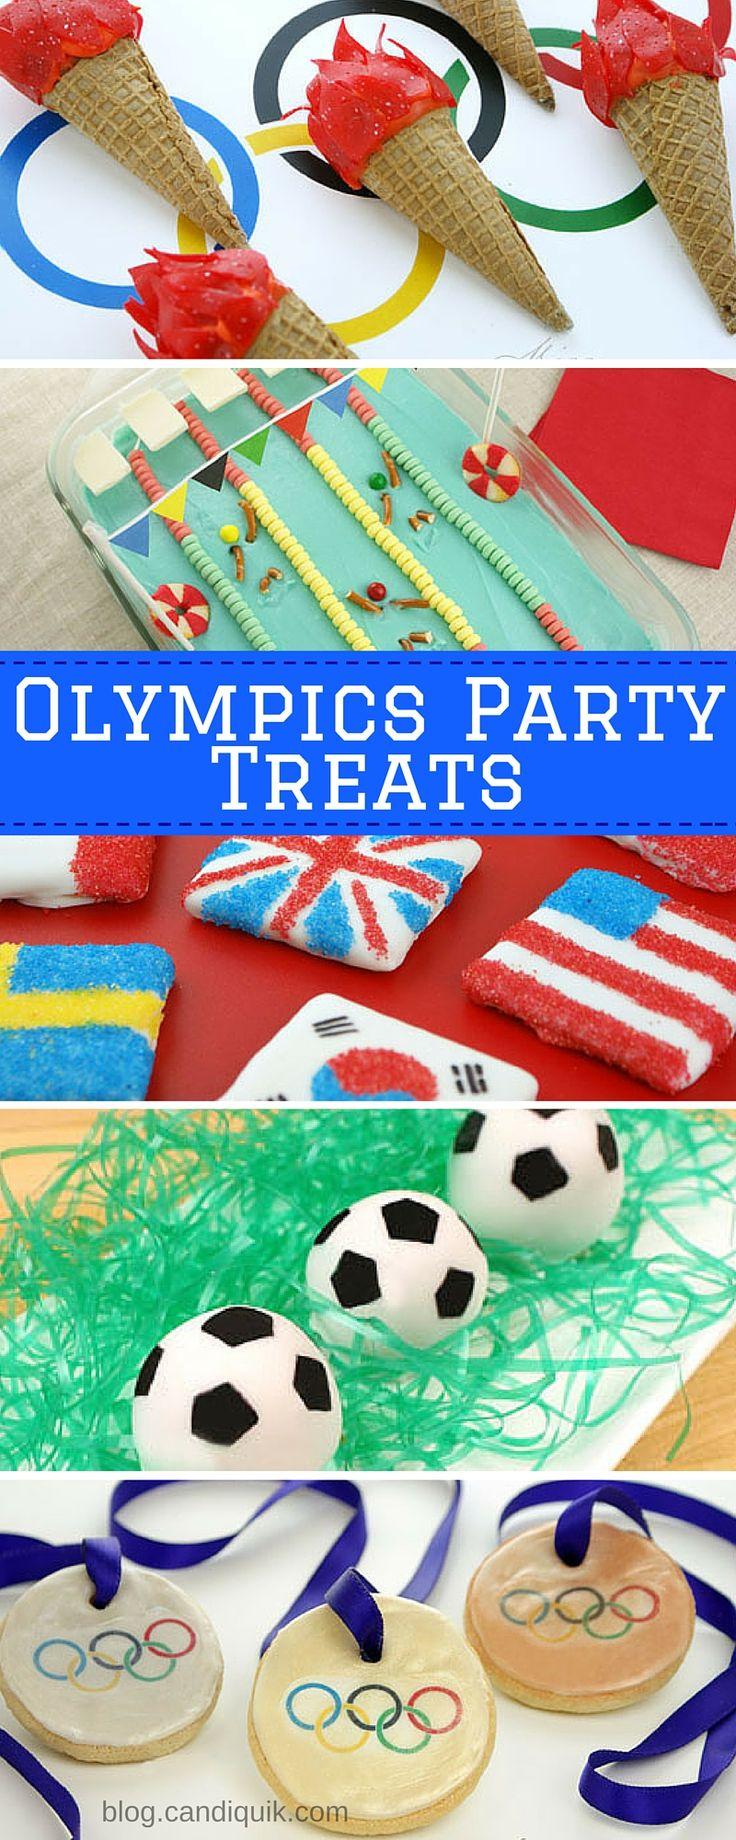 20+ Olympic Themed Treats for Rio 2016!! blog.candiquik.com